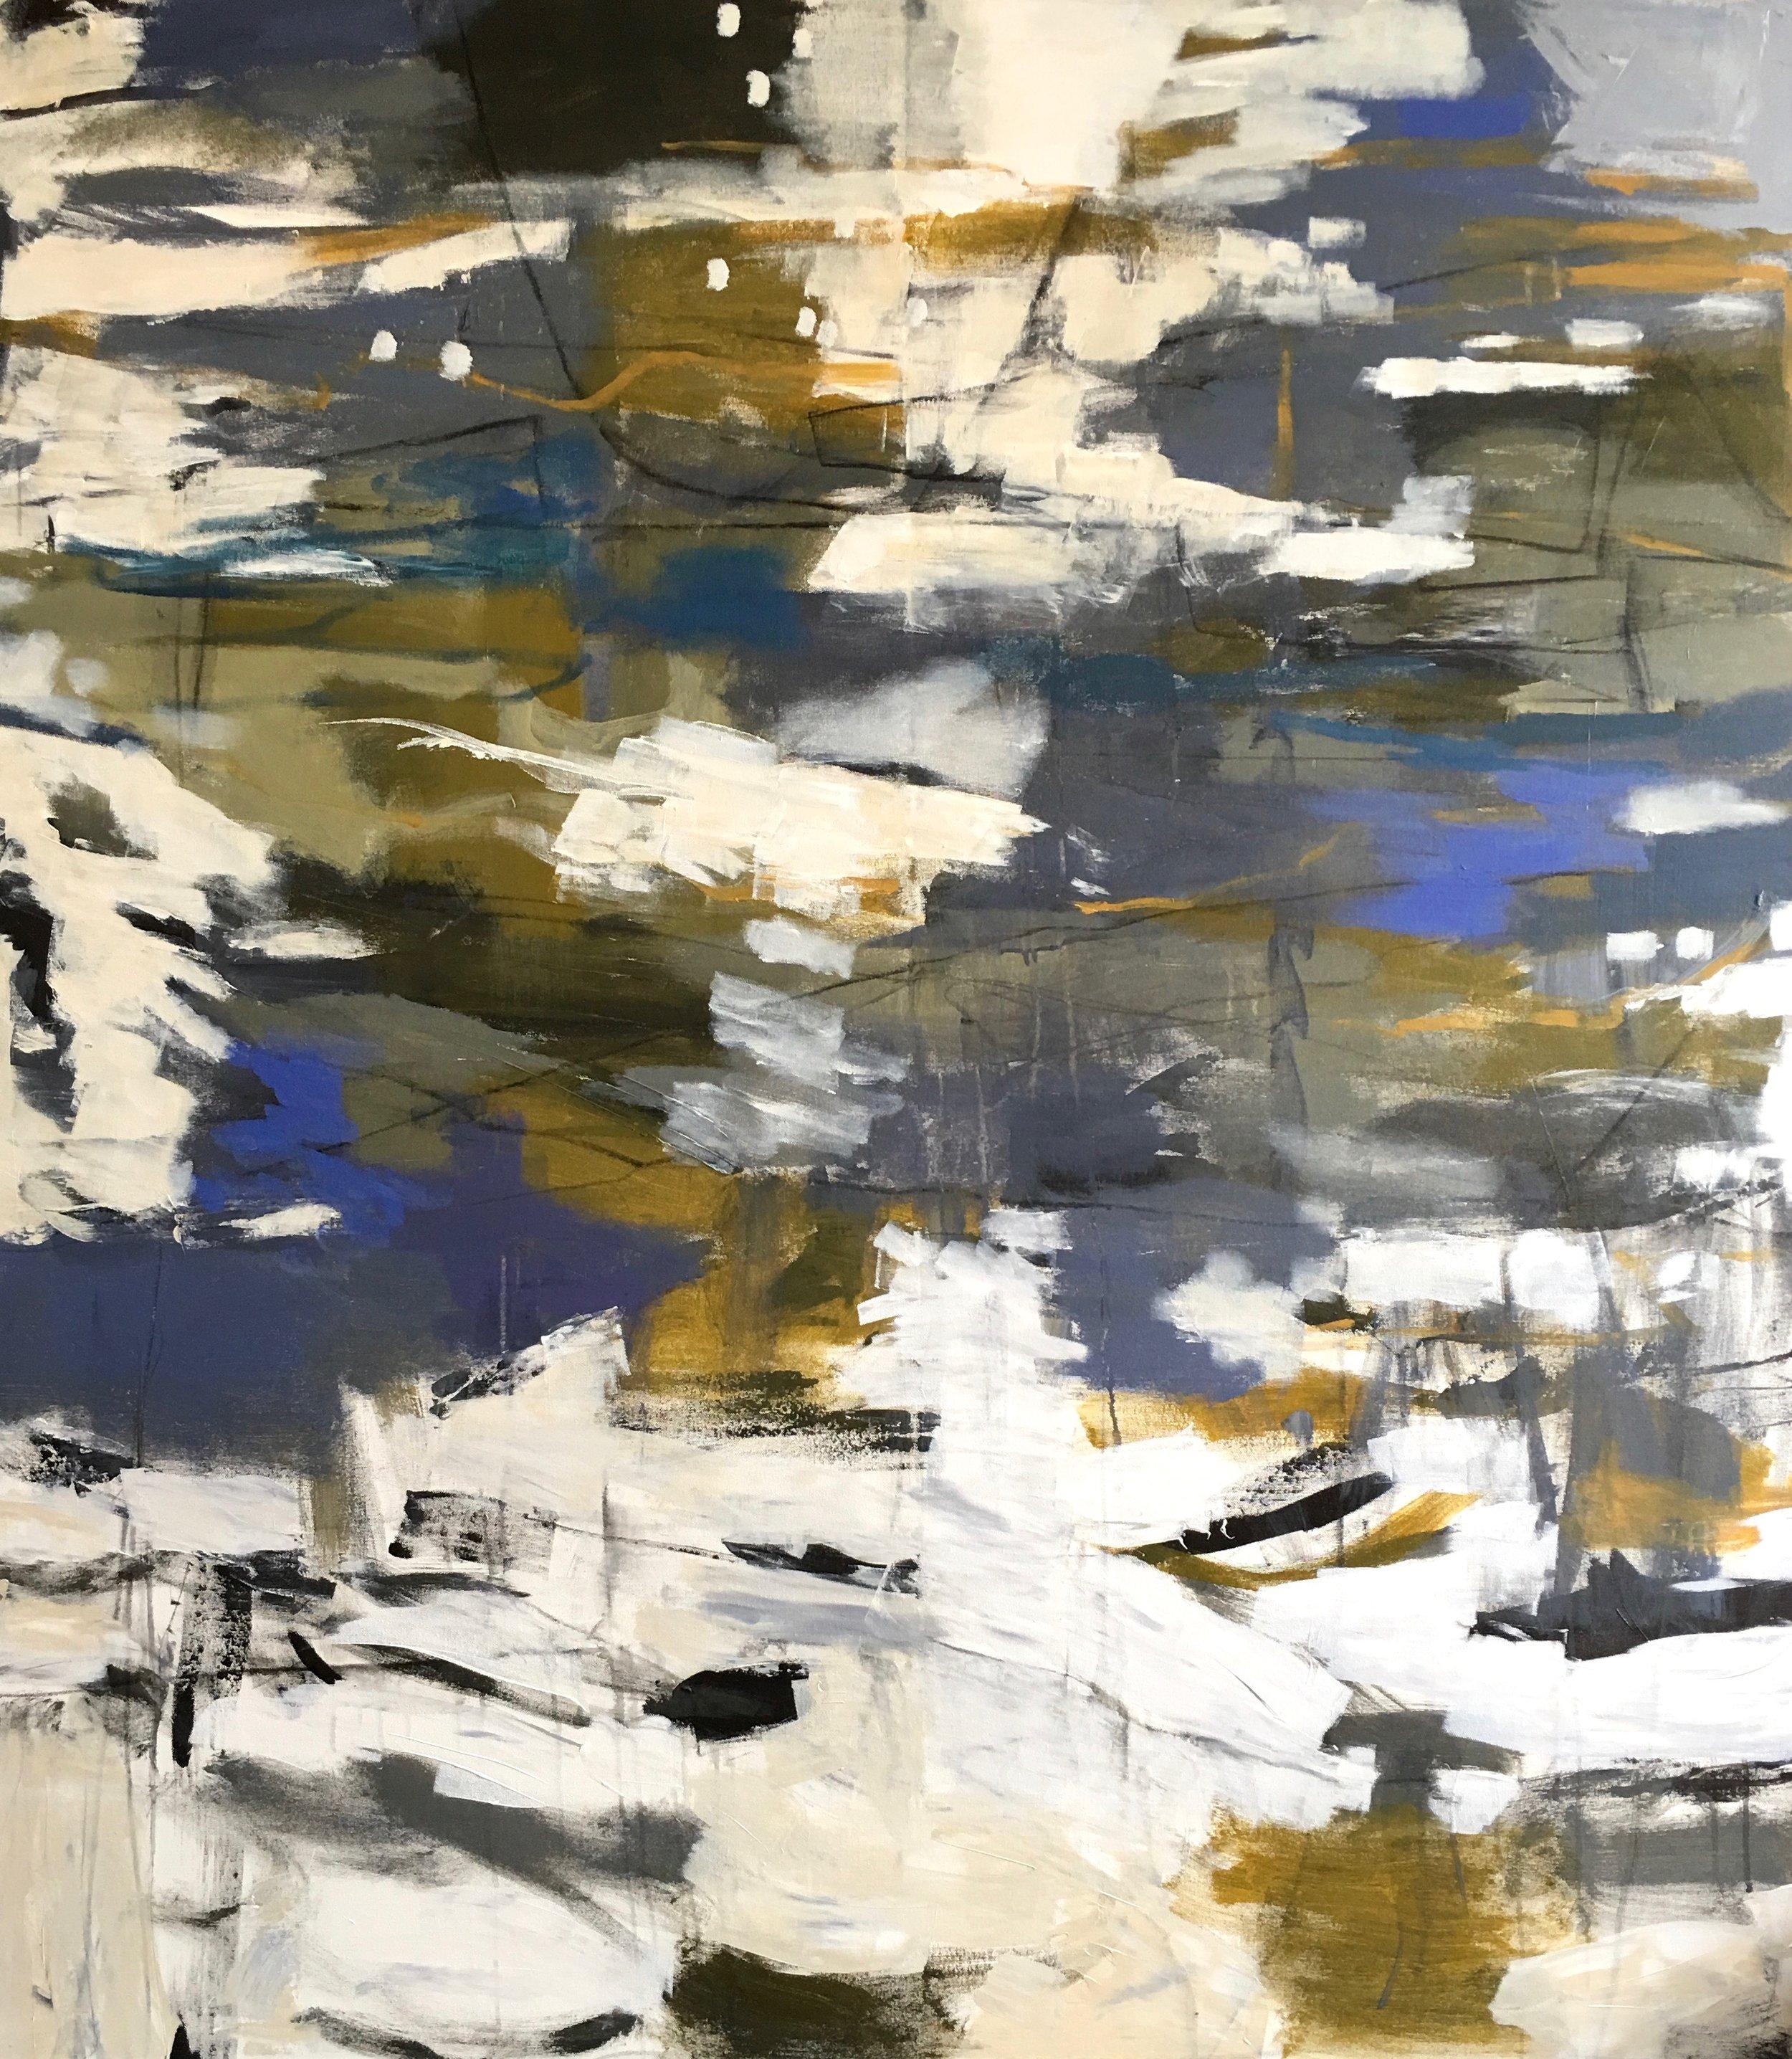 "BEACH DAY 58"" x 51"" Acrylic/Mixed Media on Canvas"